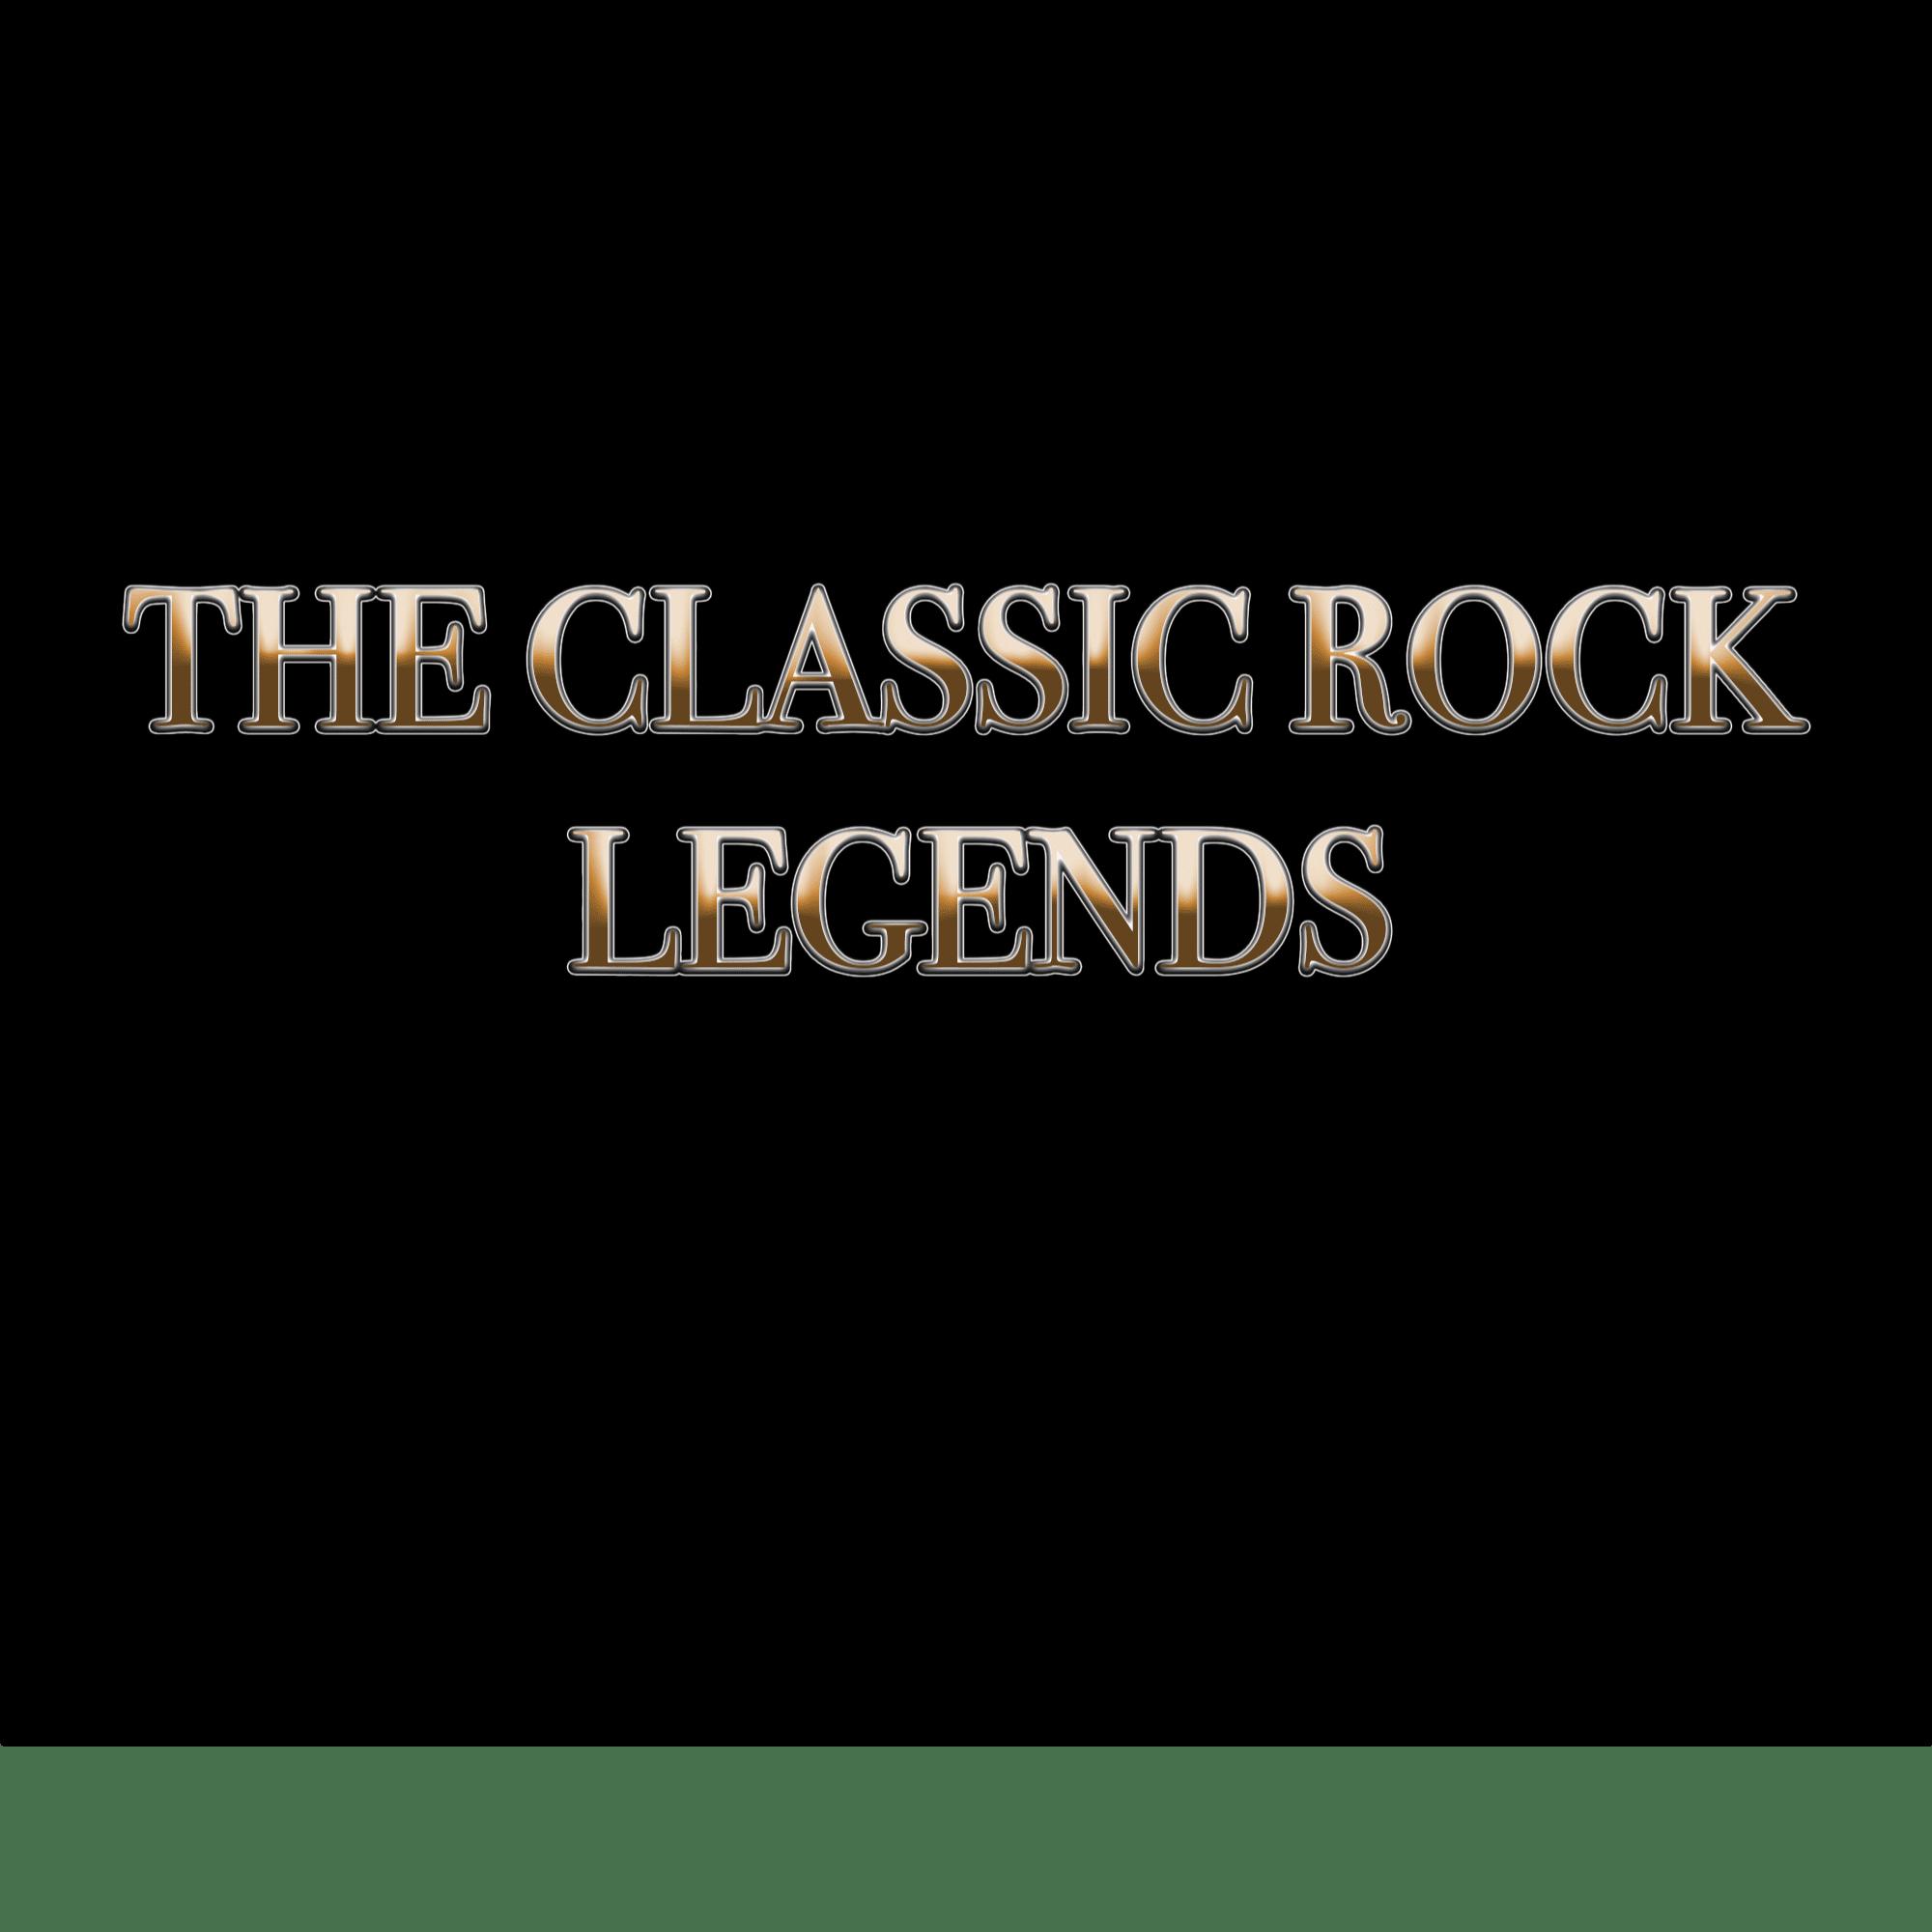 The Classic Rock Legends